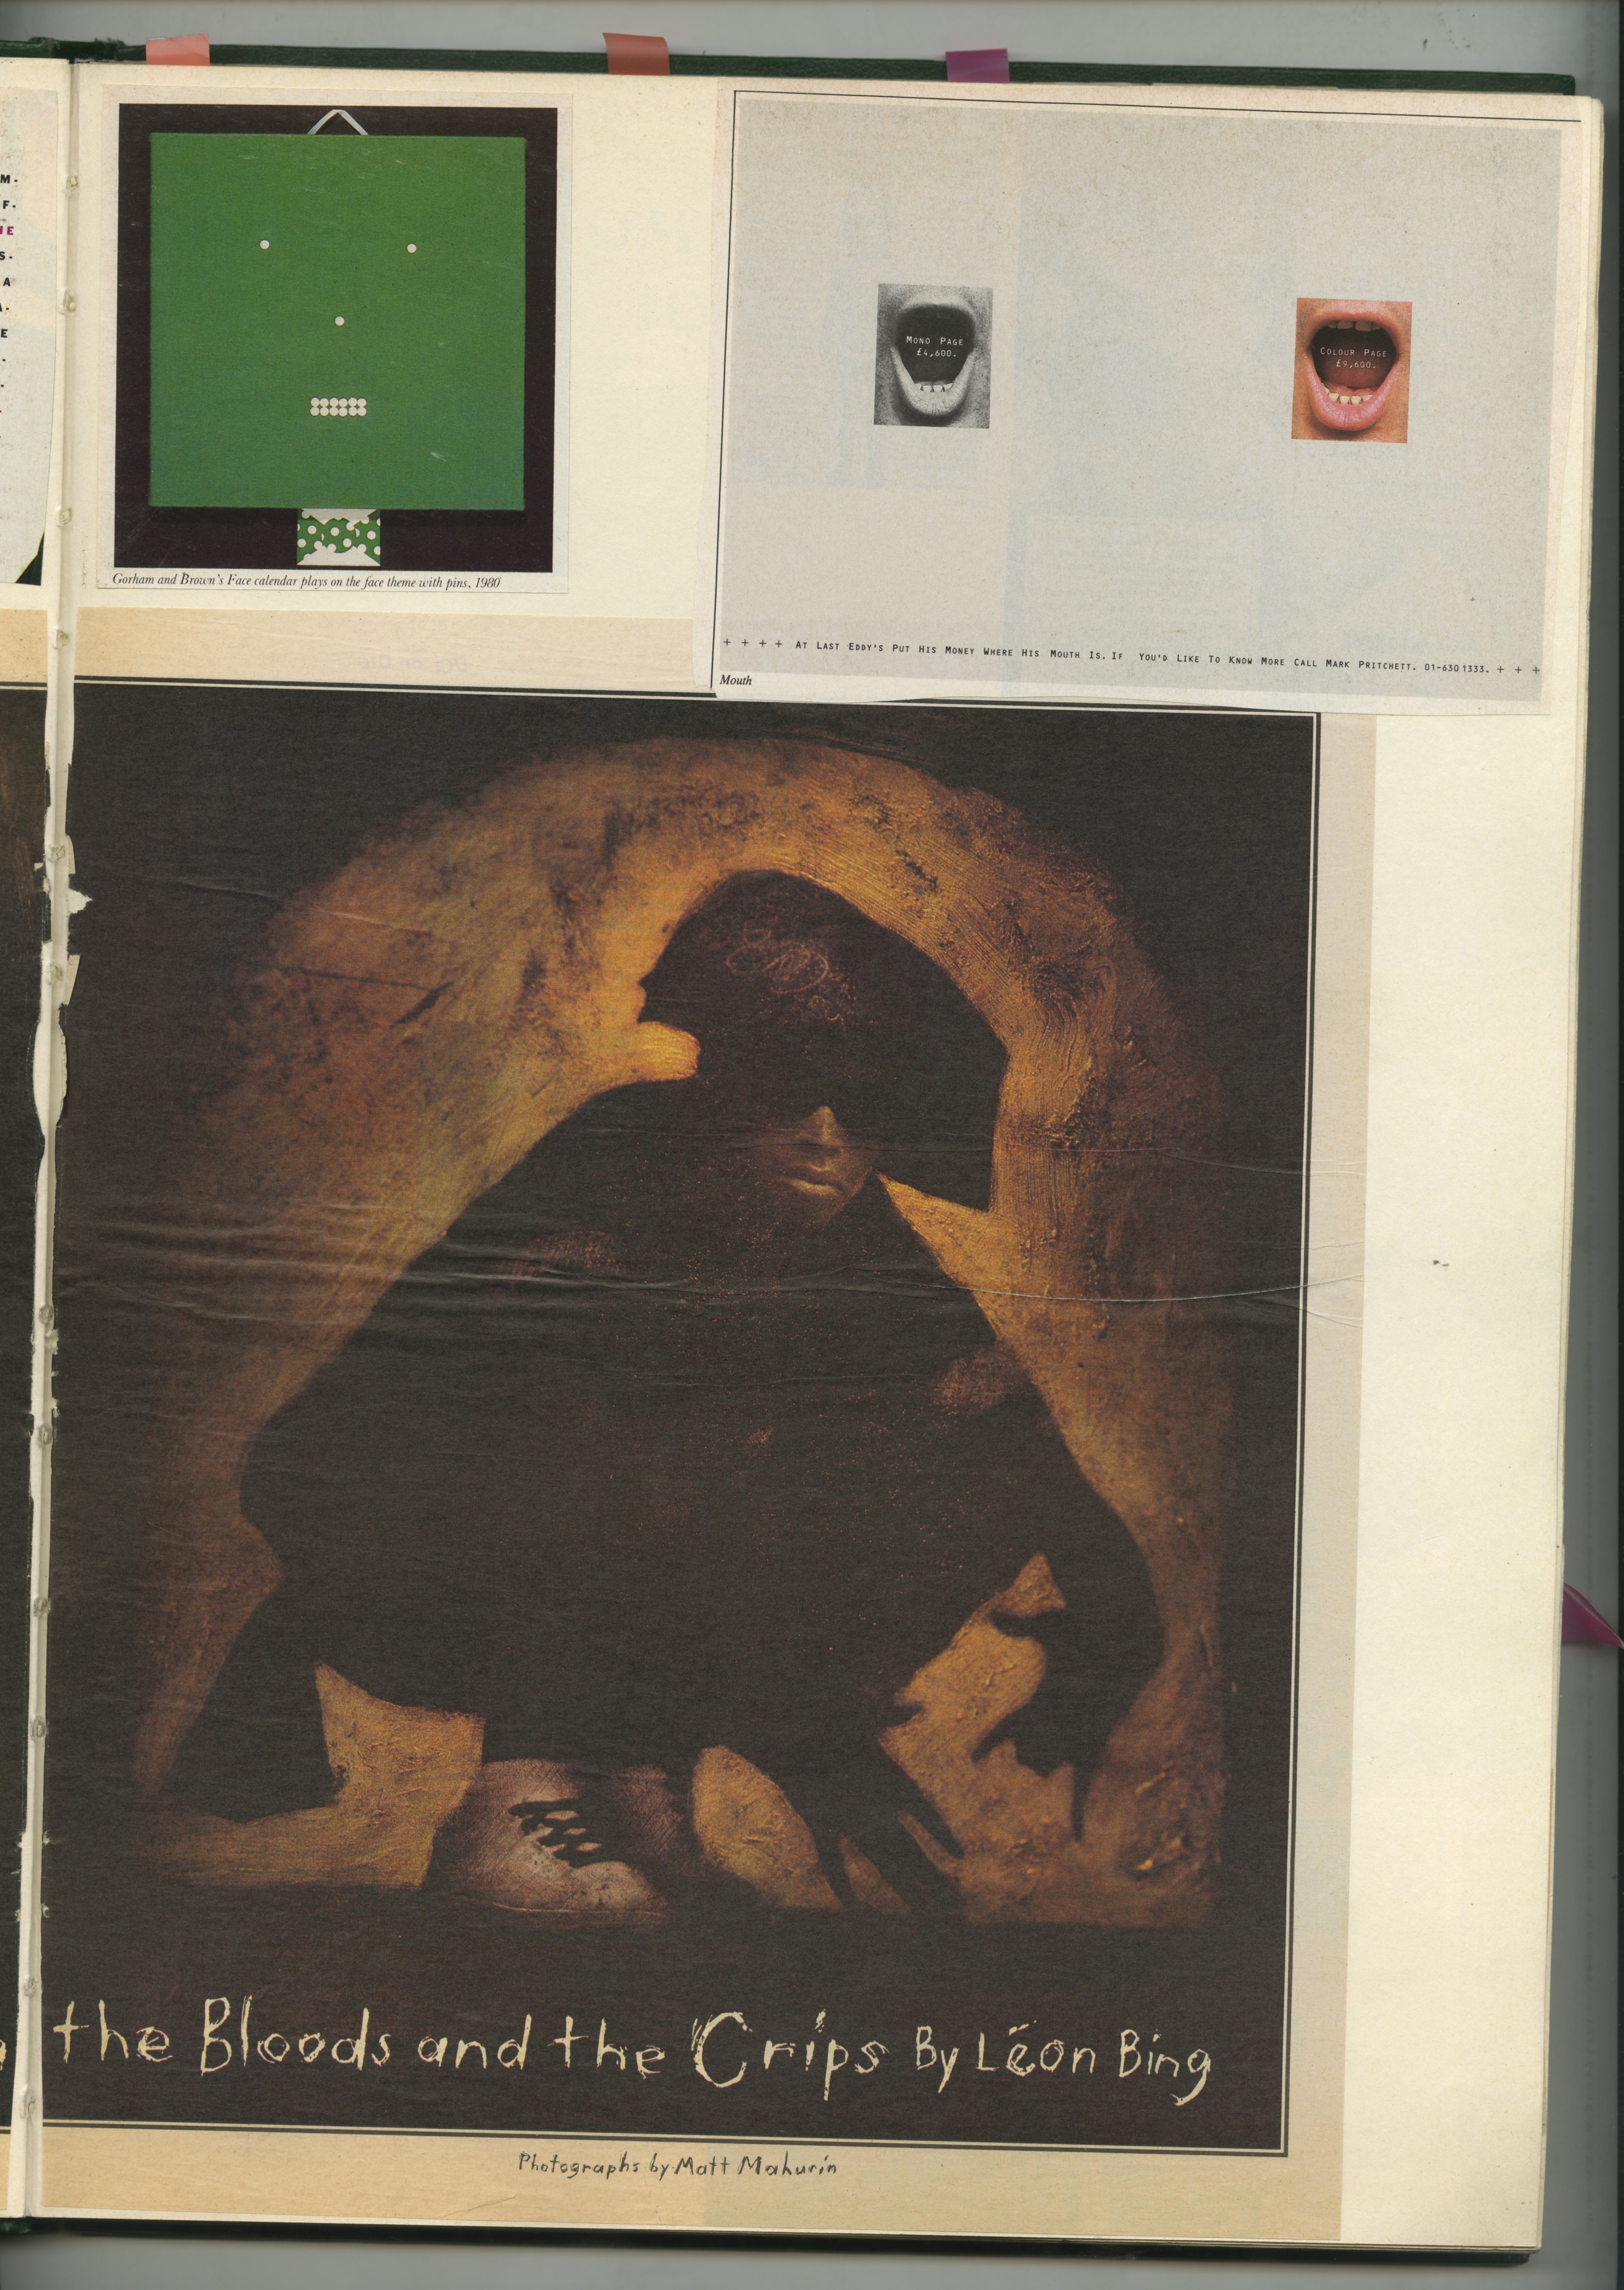 14. GREEN BOOKS: 'Type'